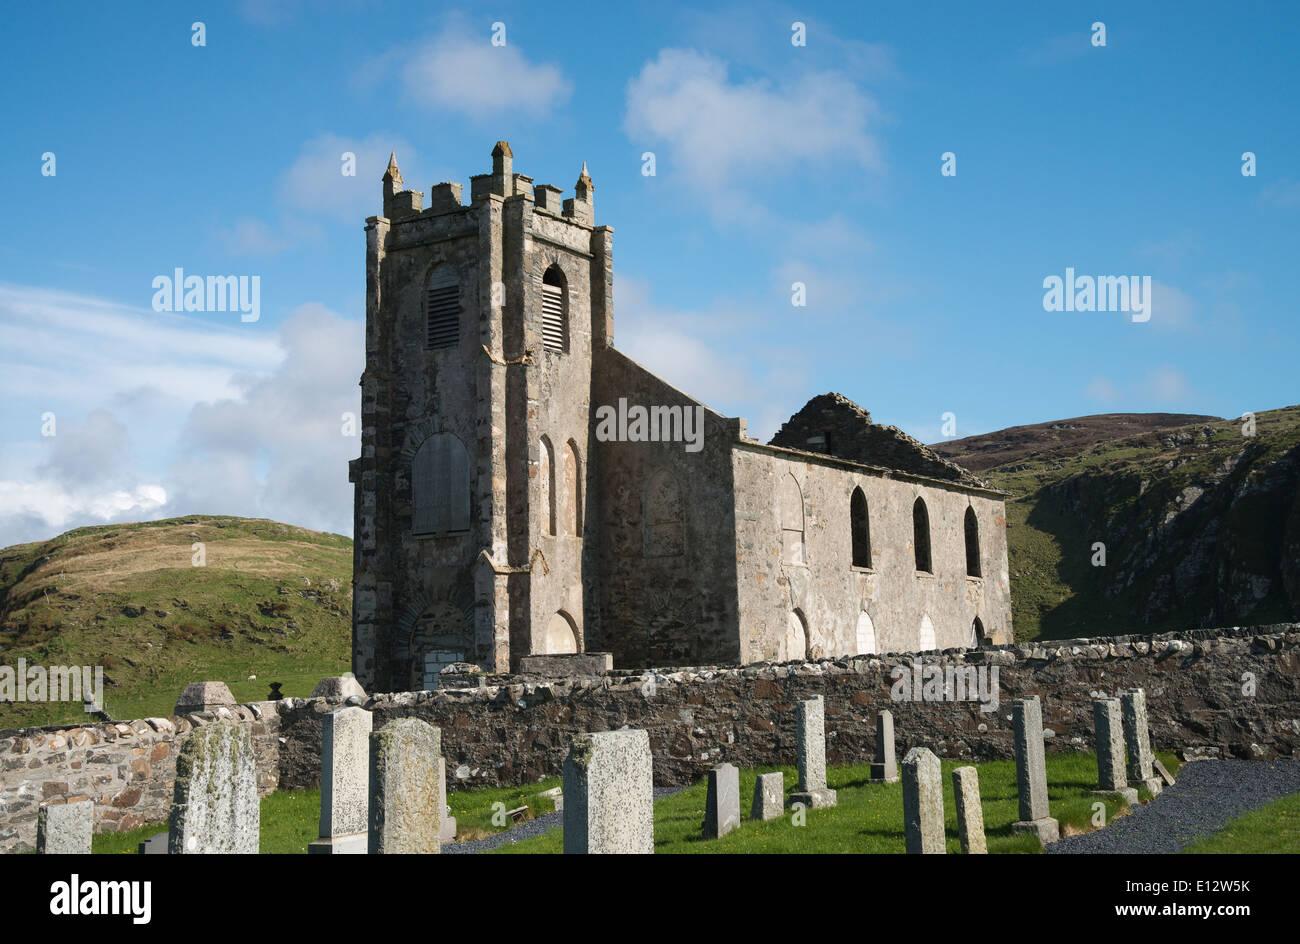 Ruins of Kilchoman Old Parish Church, Islay, Scotland -1 - Stock Image